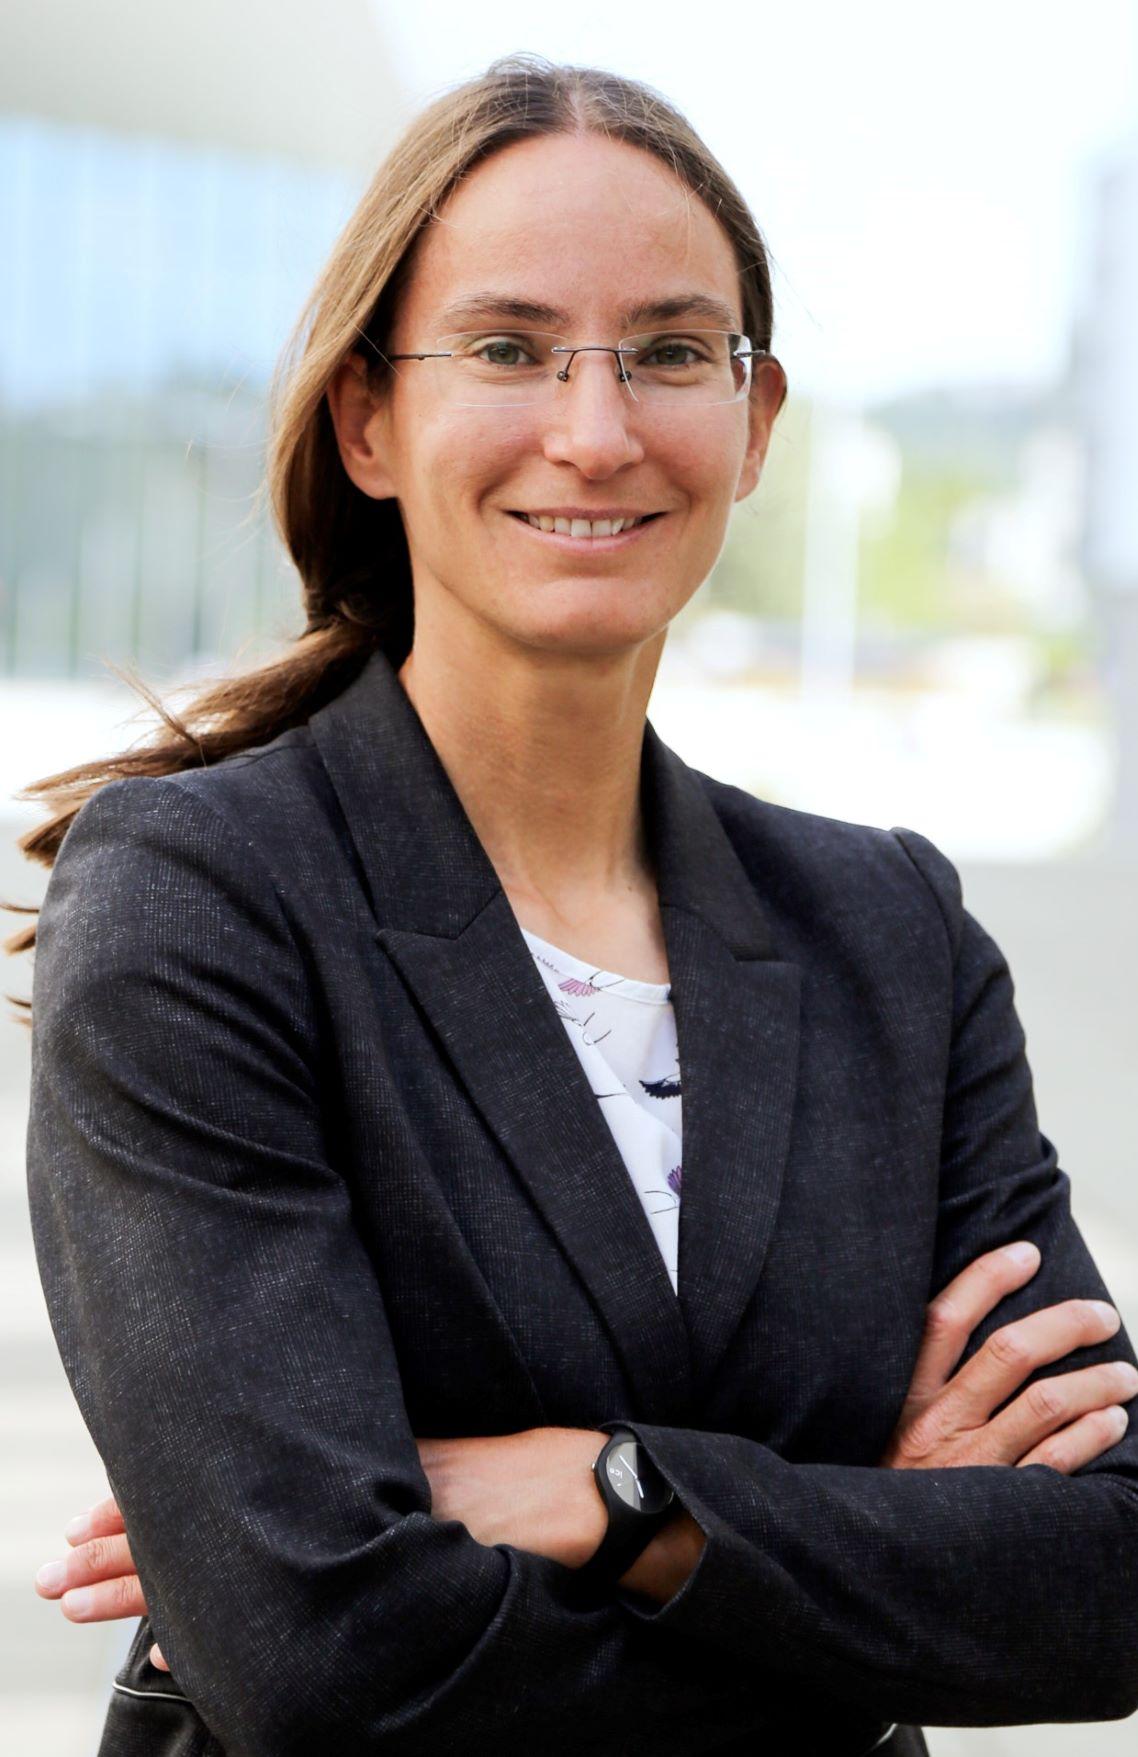 Julia Schmale